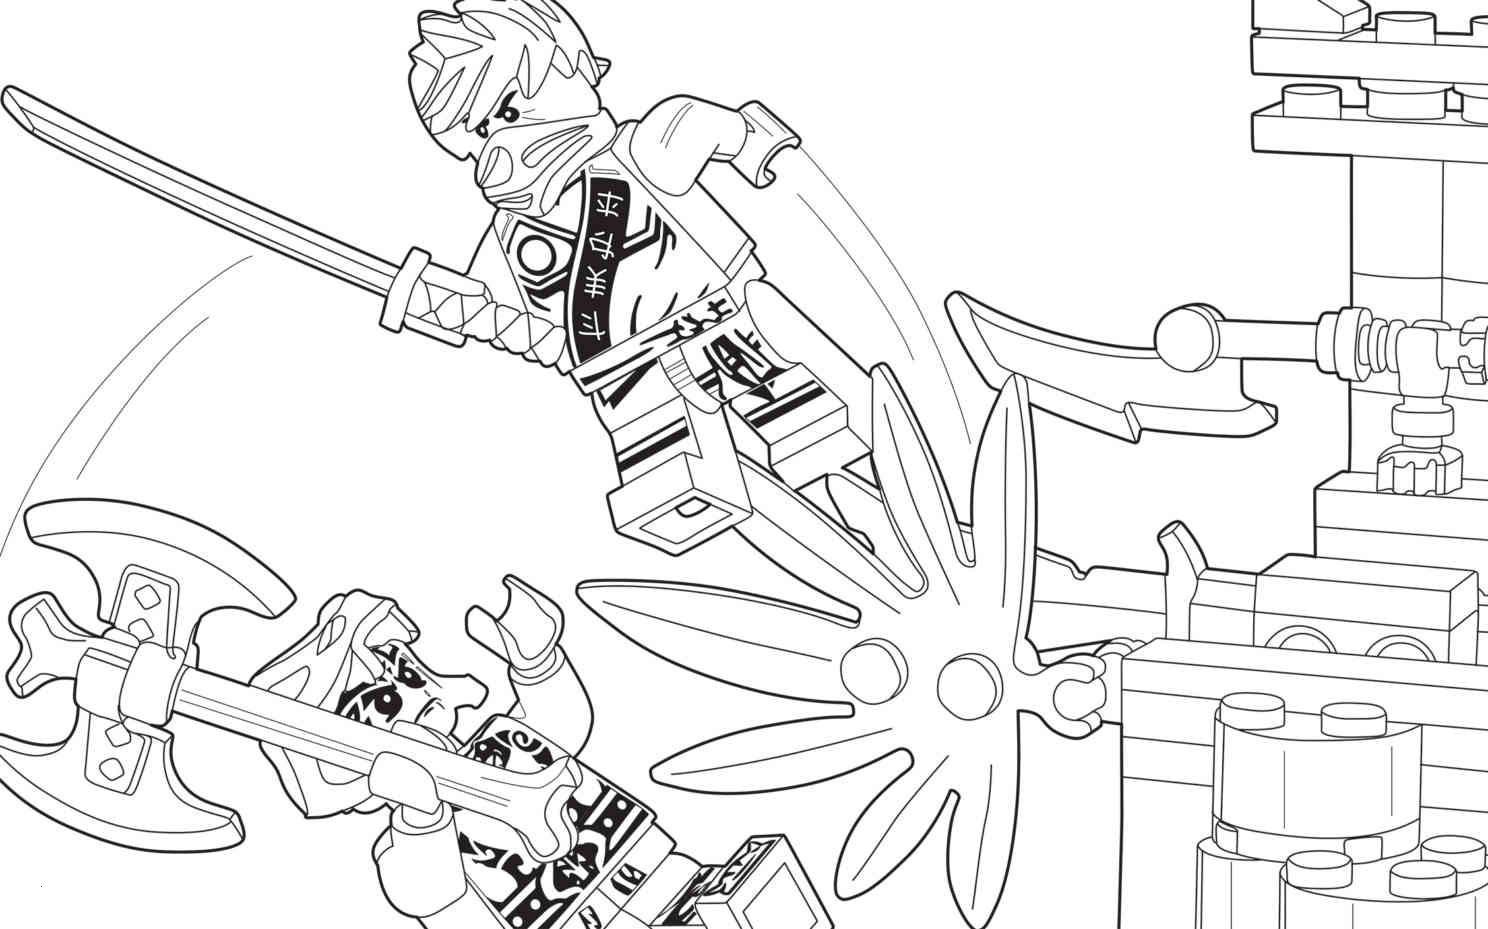 Ninjago Cole Ausmalbilder Inspirierend Lloyd Ninjago Coloring Page Lego Ninjago Kai with Sword Coloring Fotografieren